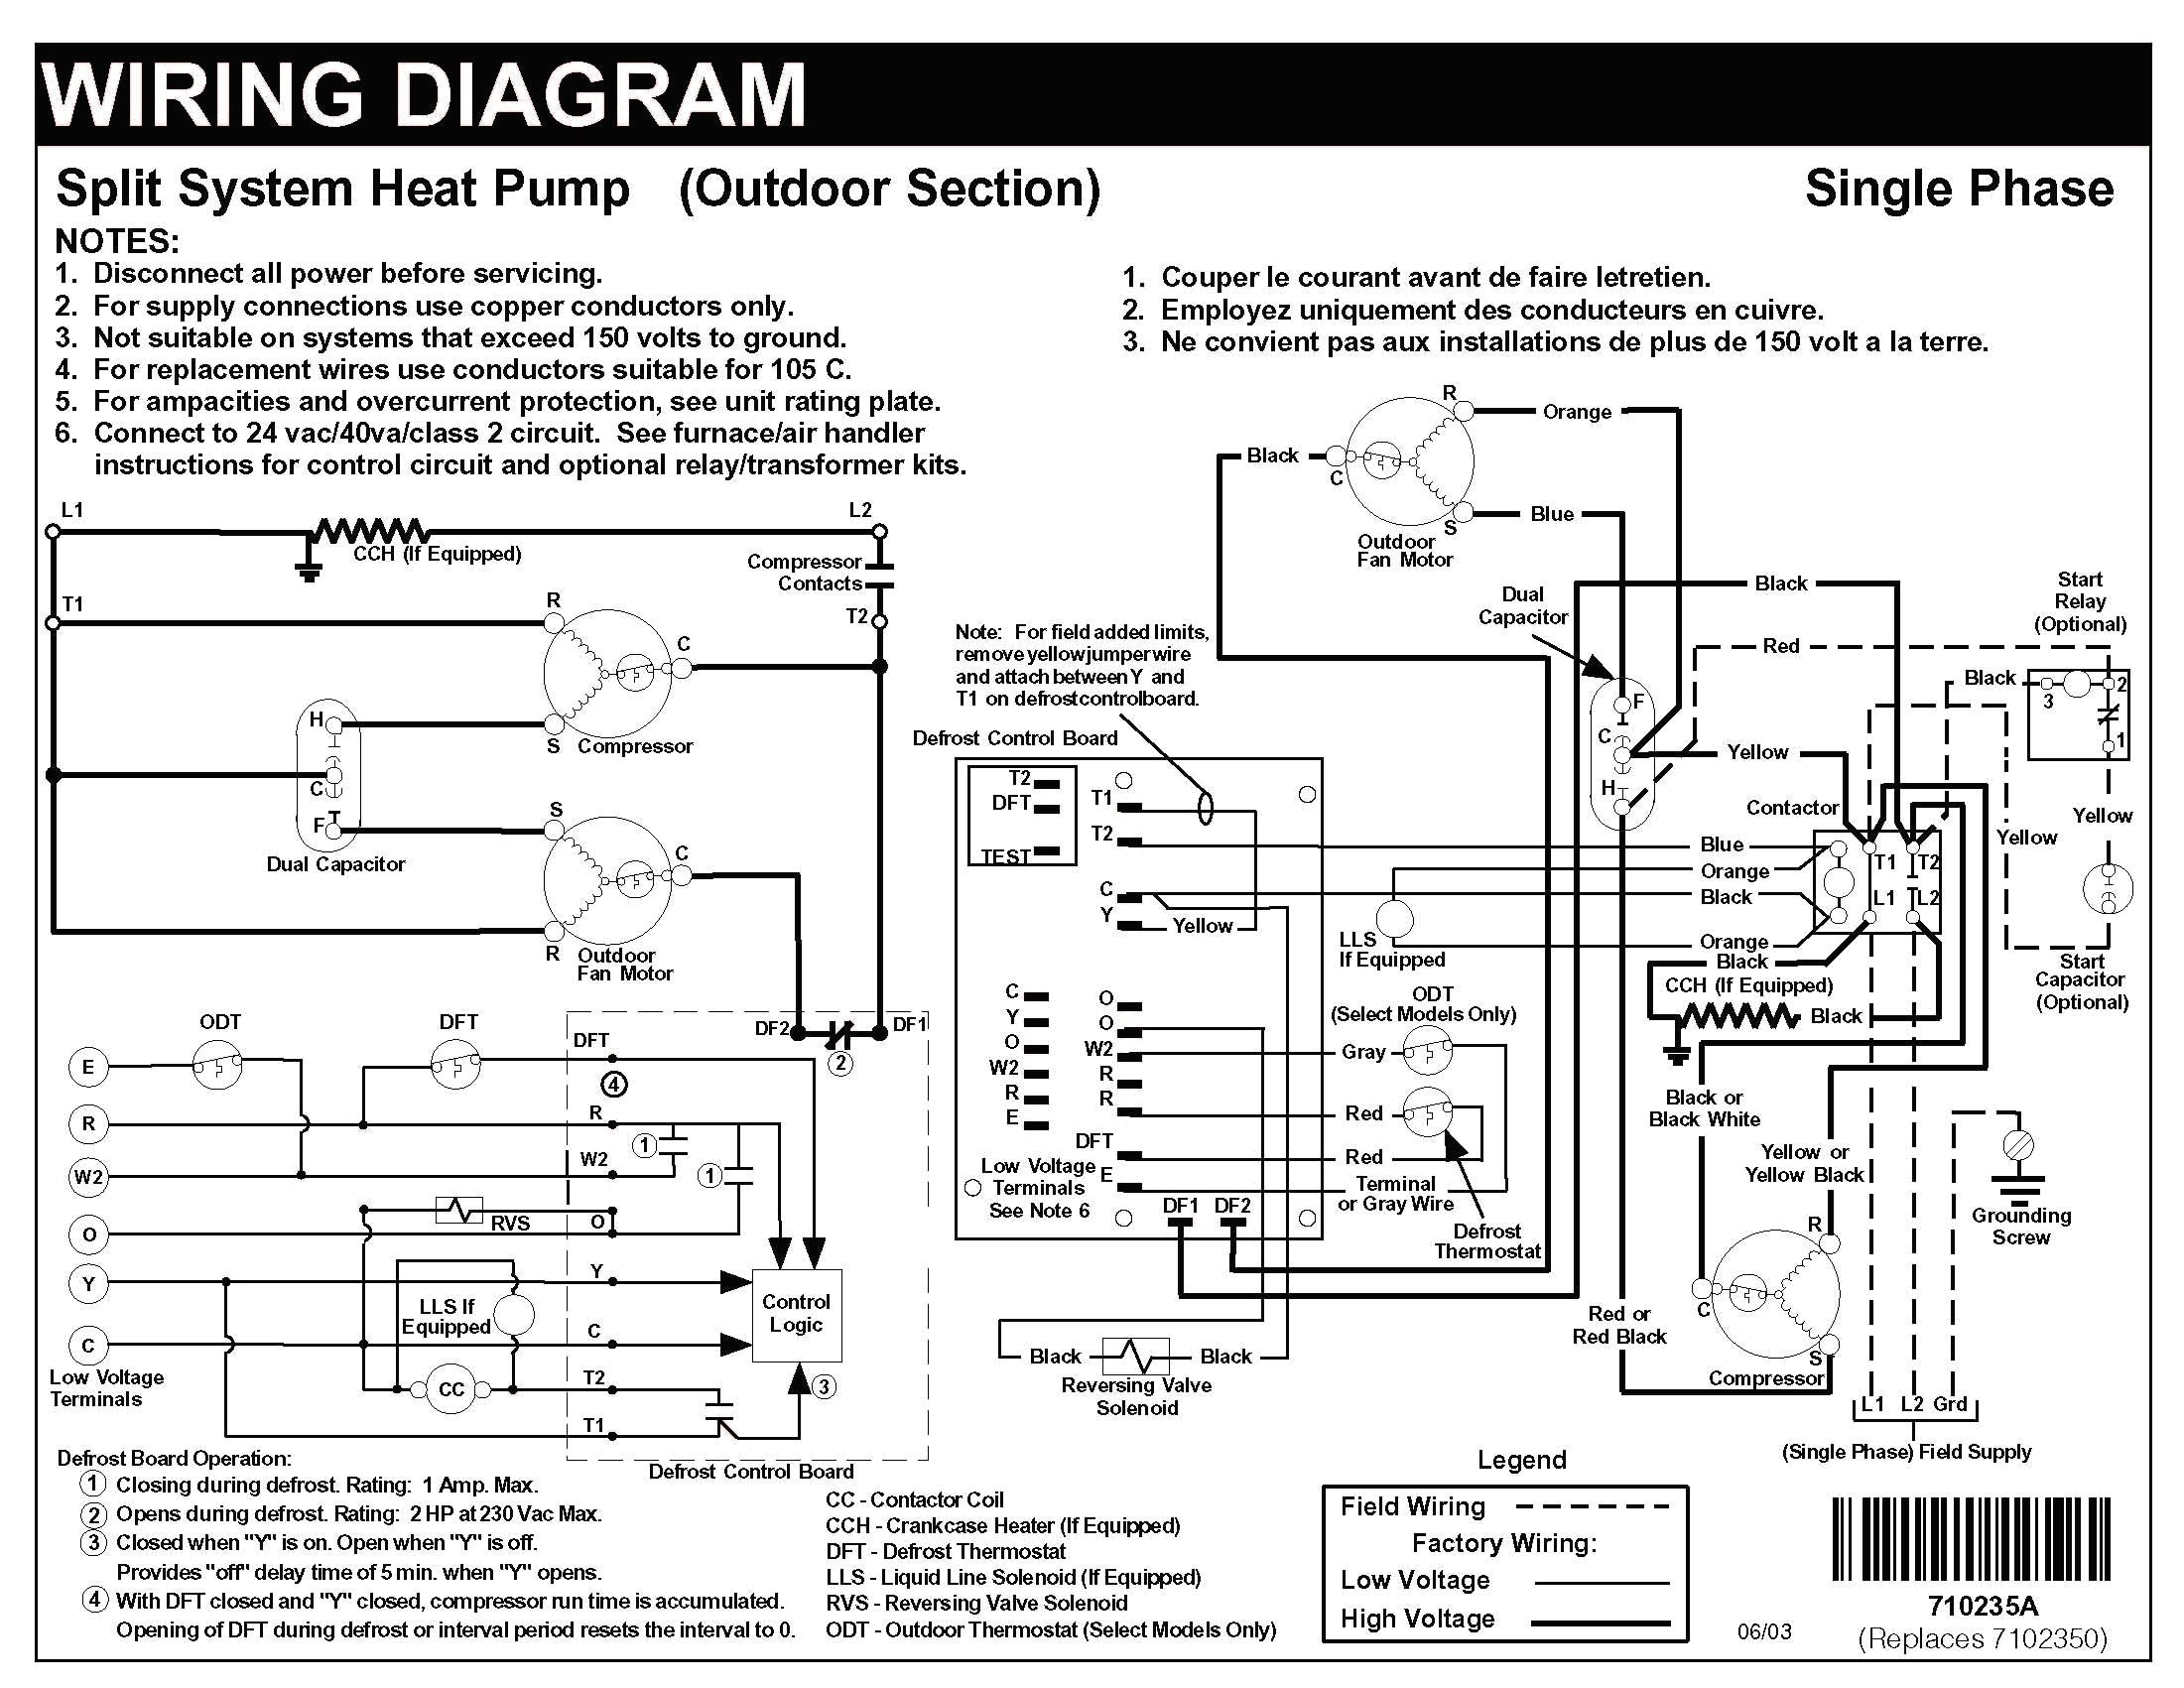 Ameristar Heat Pump Wiring Diagram New Heat Pump Wiring Diagram Carrier  Thermostat With Nordyne Split